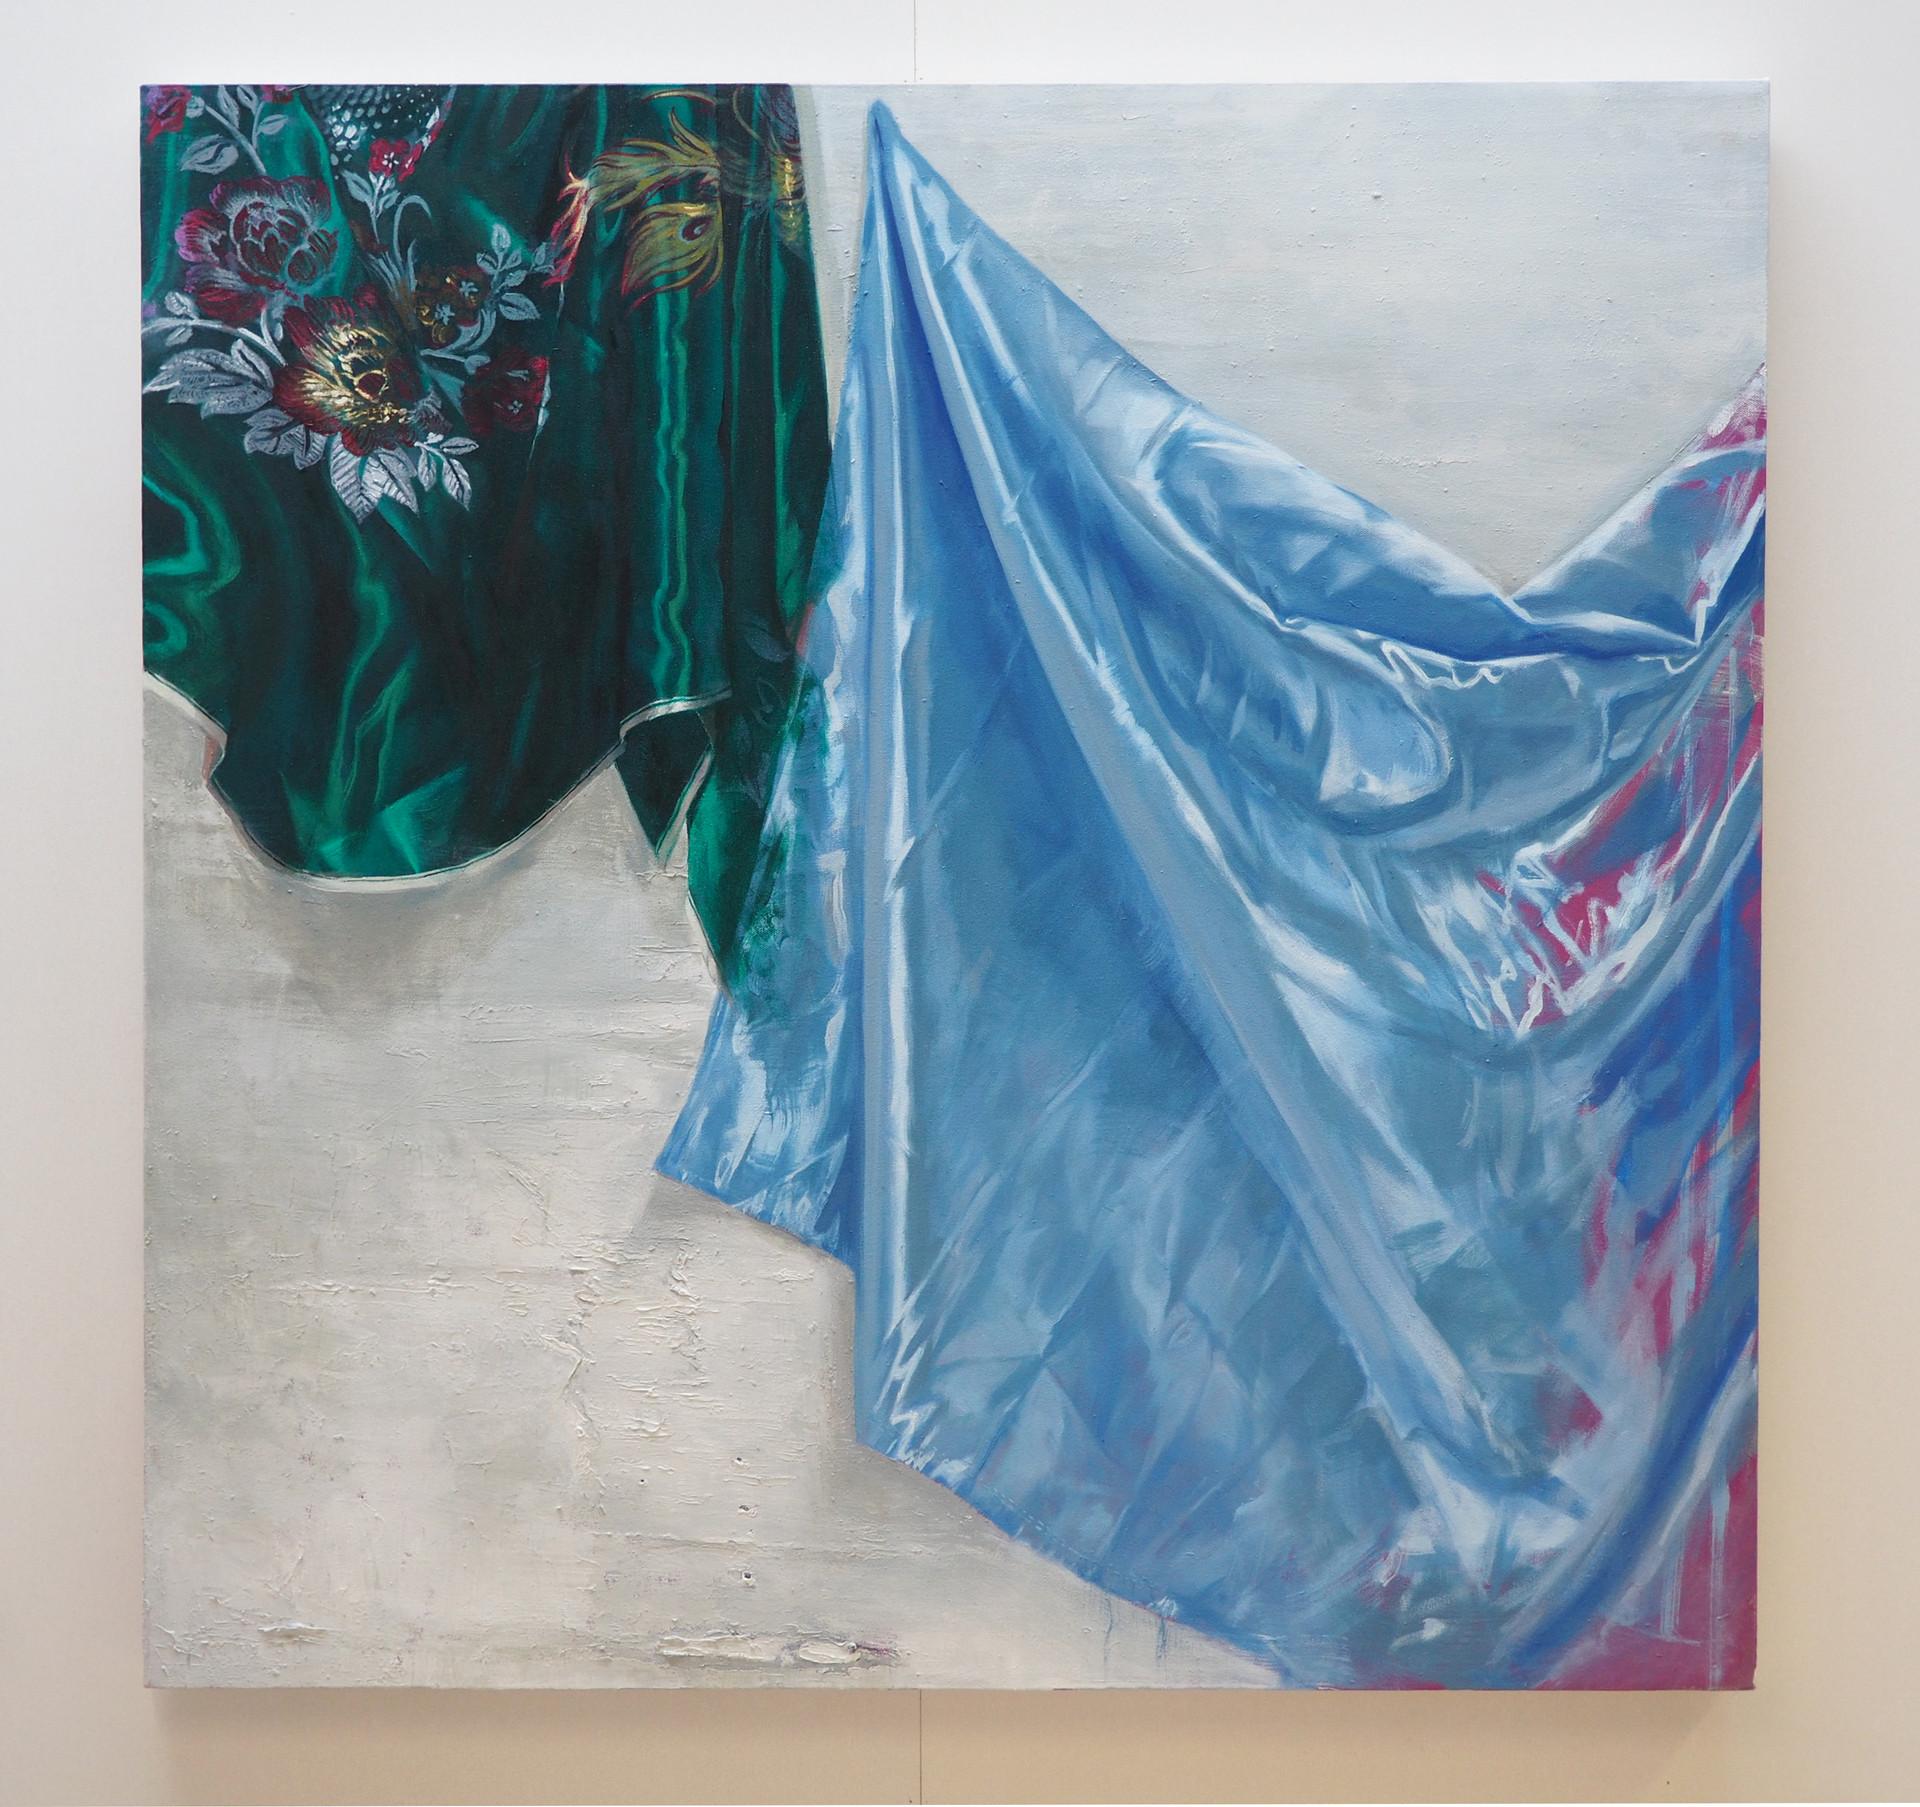 Festoons, Oil on canvas, 127 x 127 cm, 2020